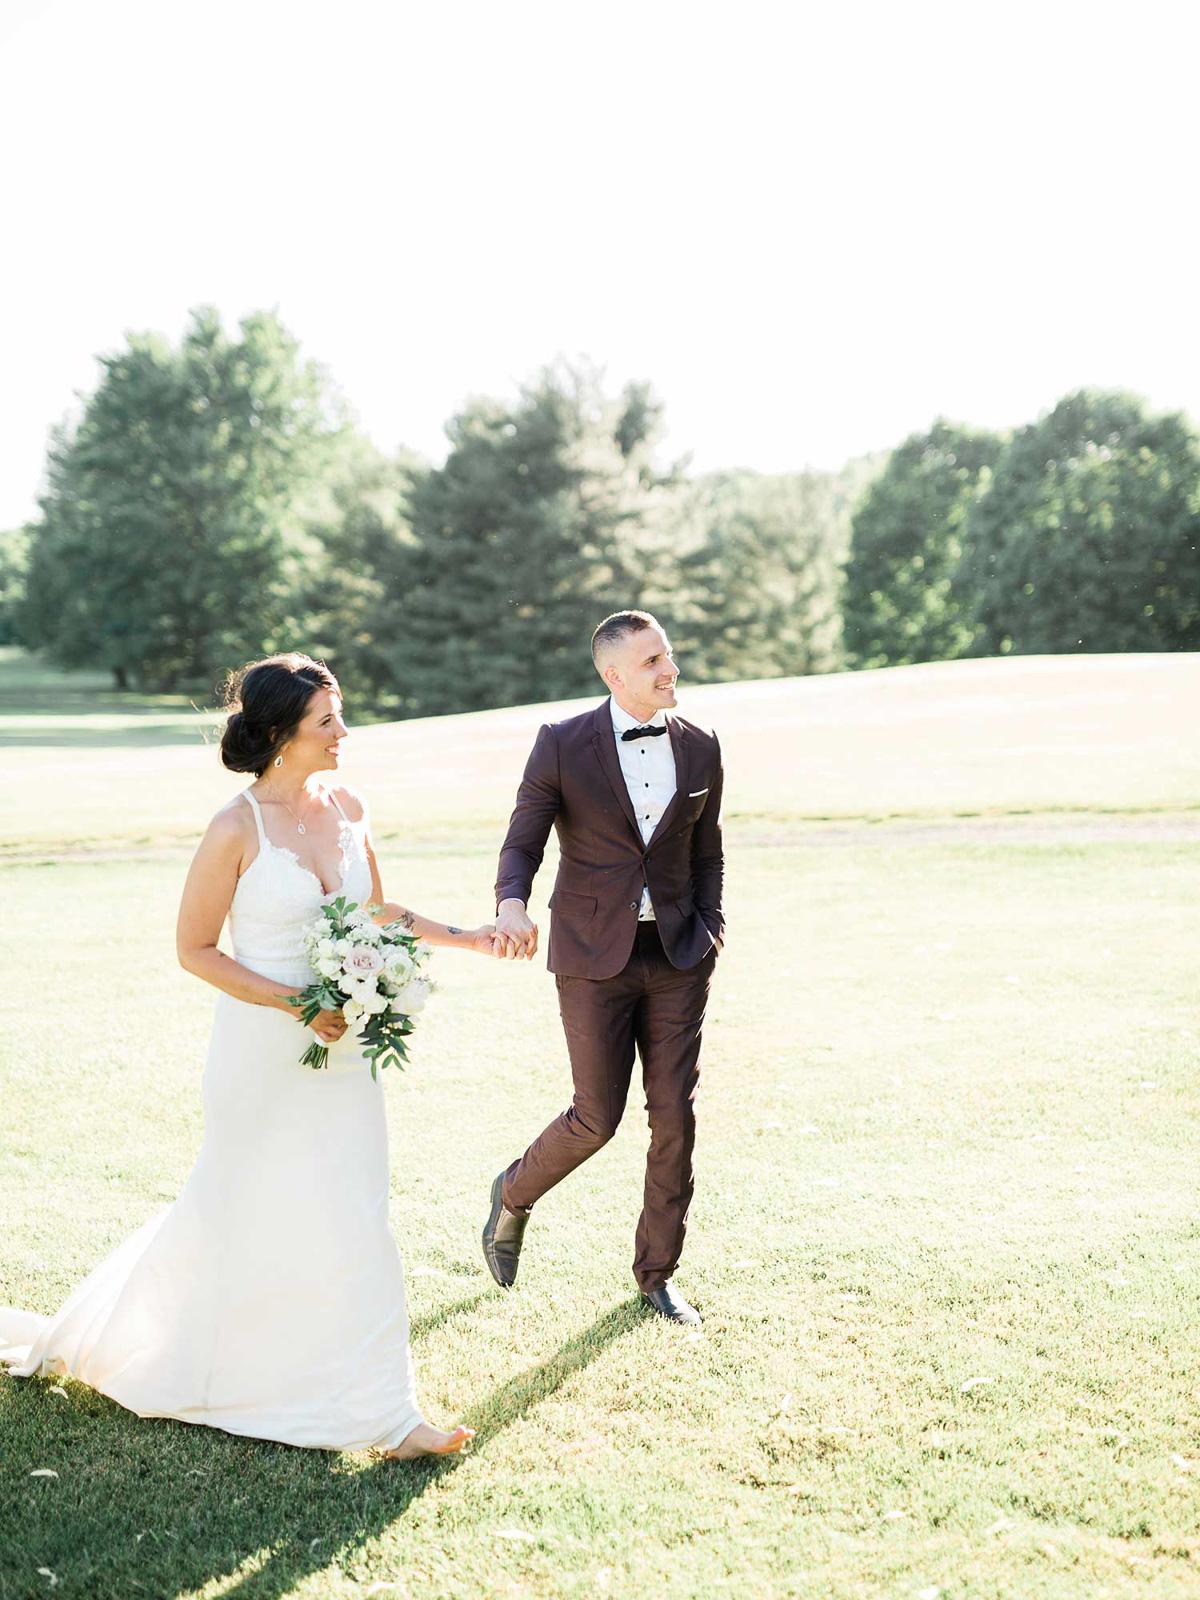 destiny-dawn-photography-vineyard-bride-swish-list-knollwood-golf-and-country-club-ancaster-wedding-editorial-24.jpg